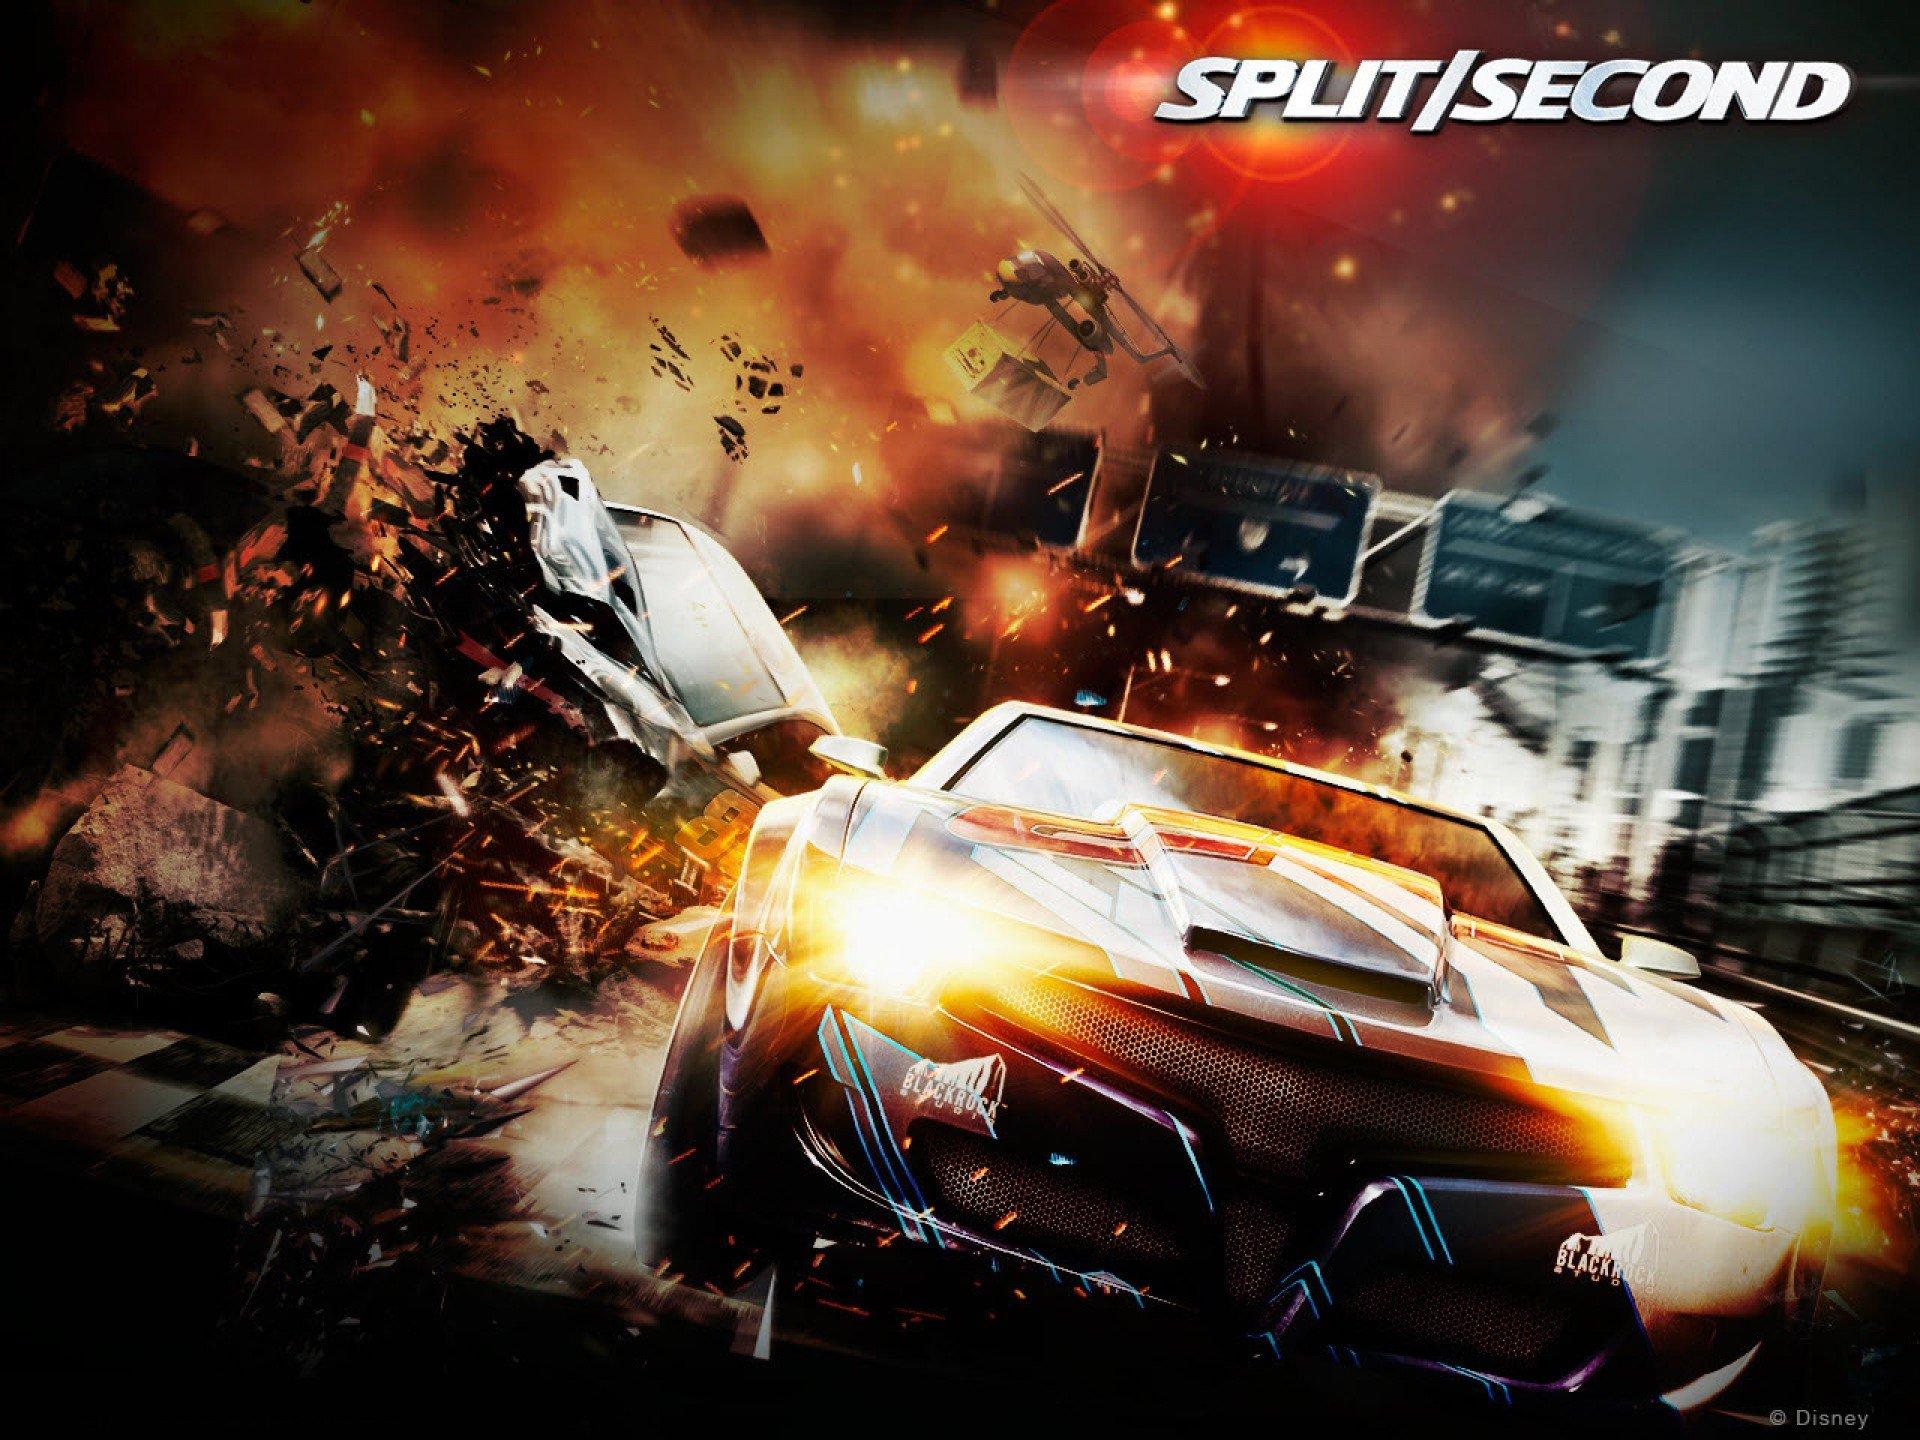 split second action racing race video game arcade. Black Bedroom Furniture Sets. Home Design Ideas